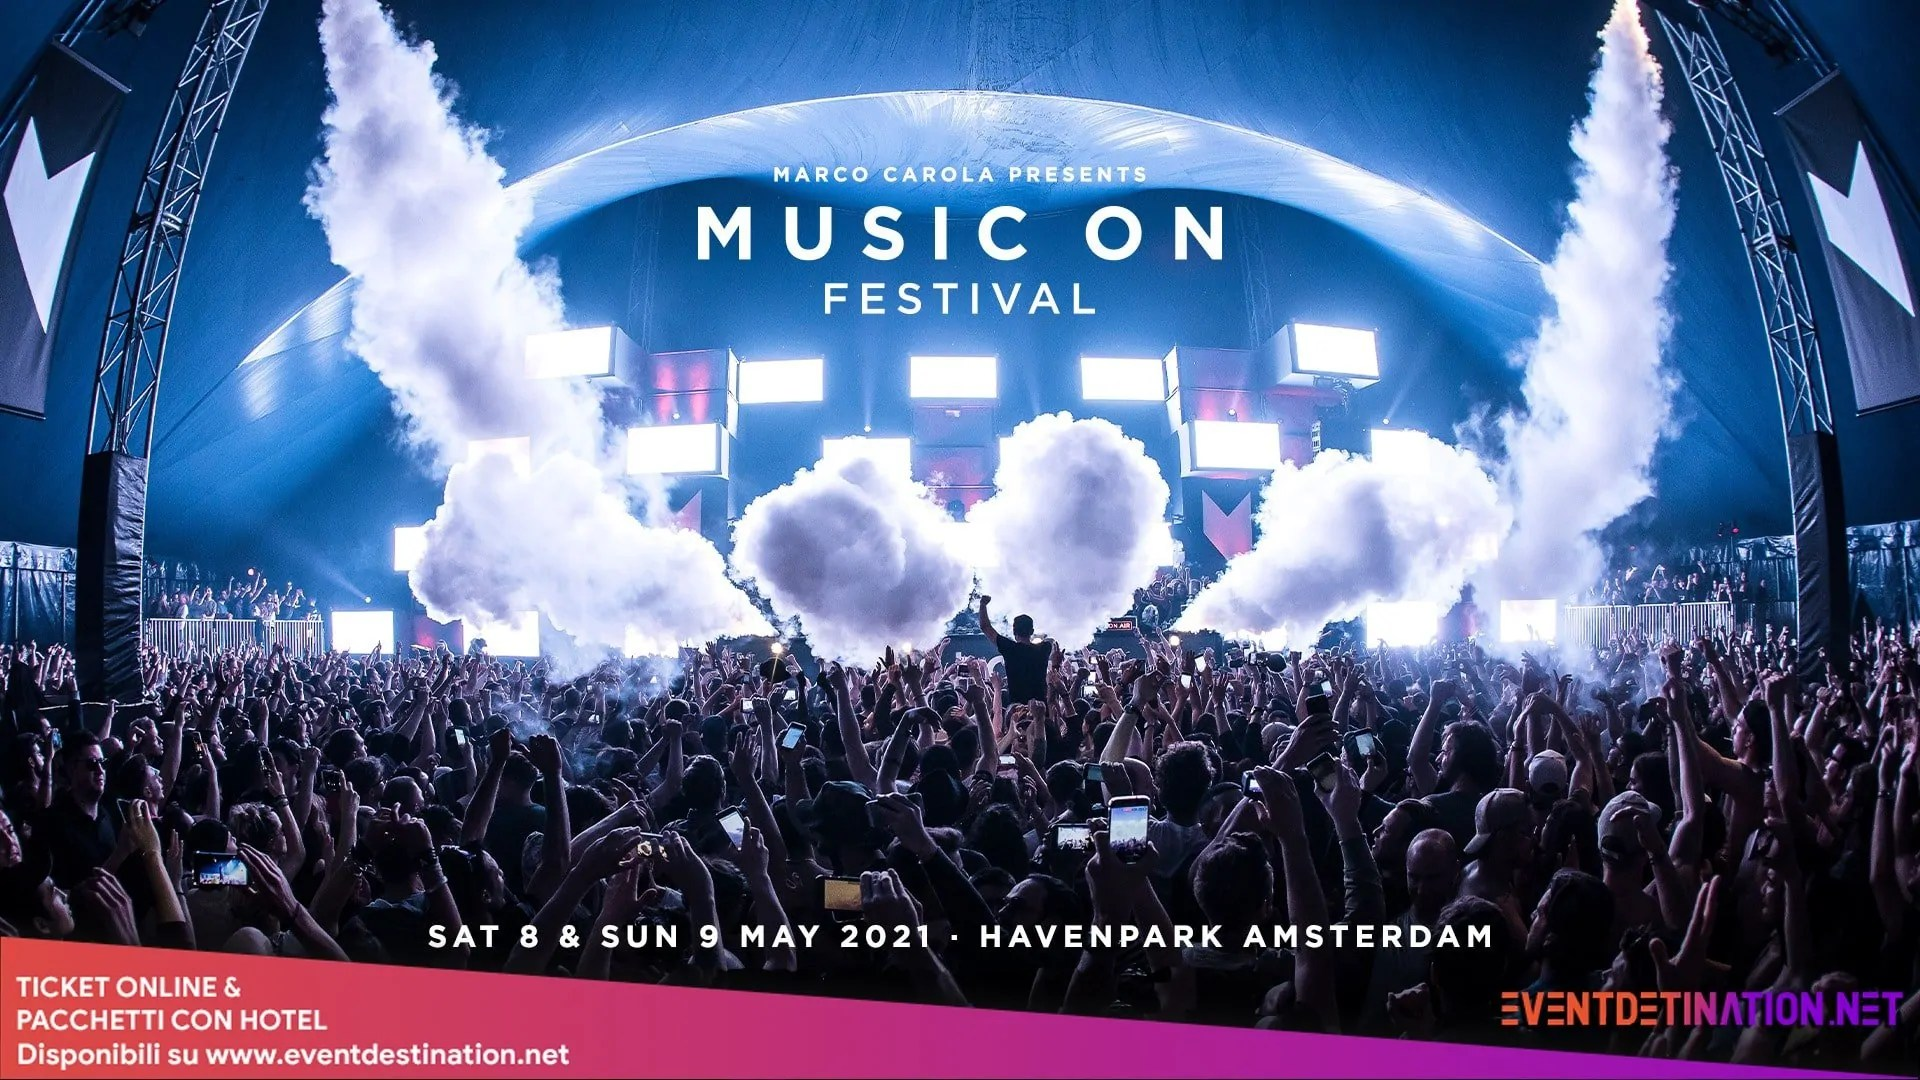 MUSIC ON Festival 2021 Amsterdam – Week End 08 E 09 Maggio 2021